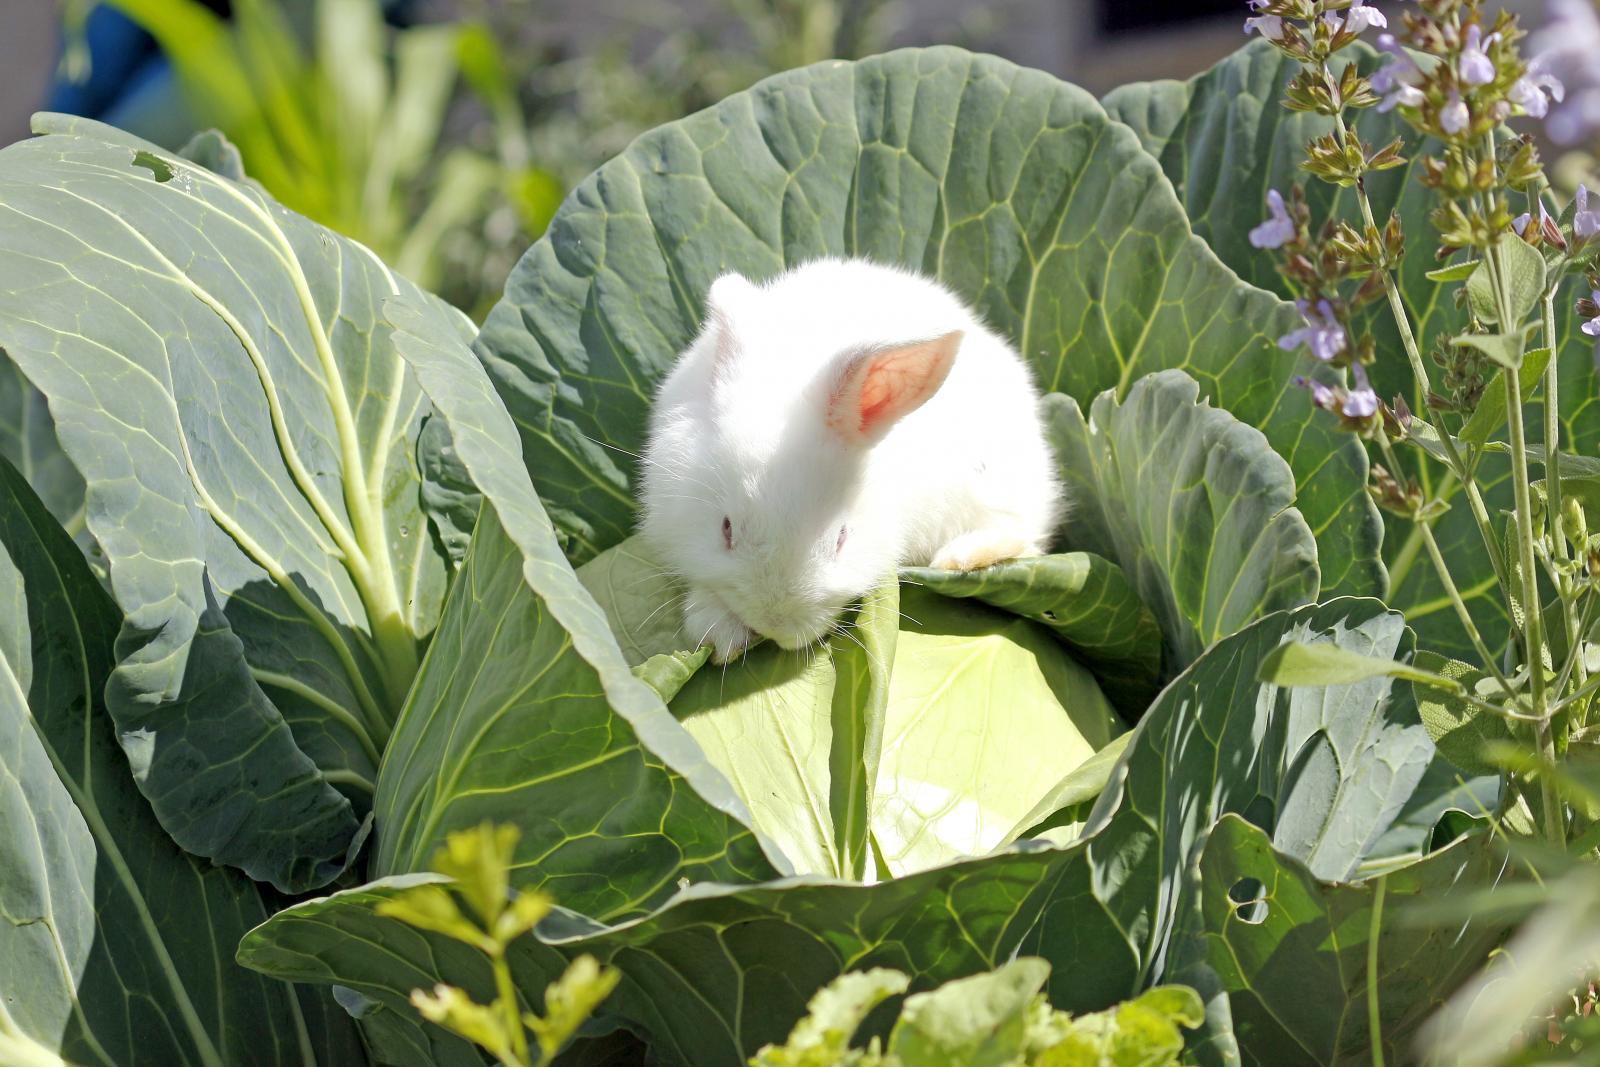 Baby rabbit in garden eating cabbage